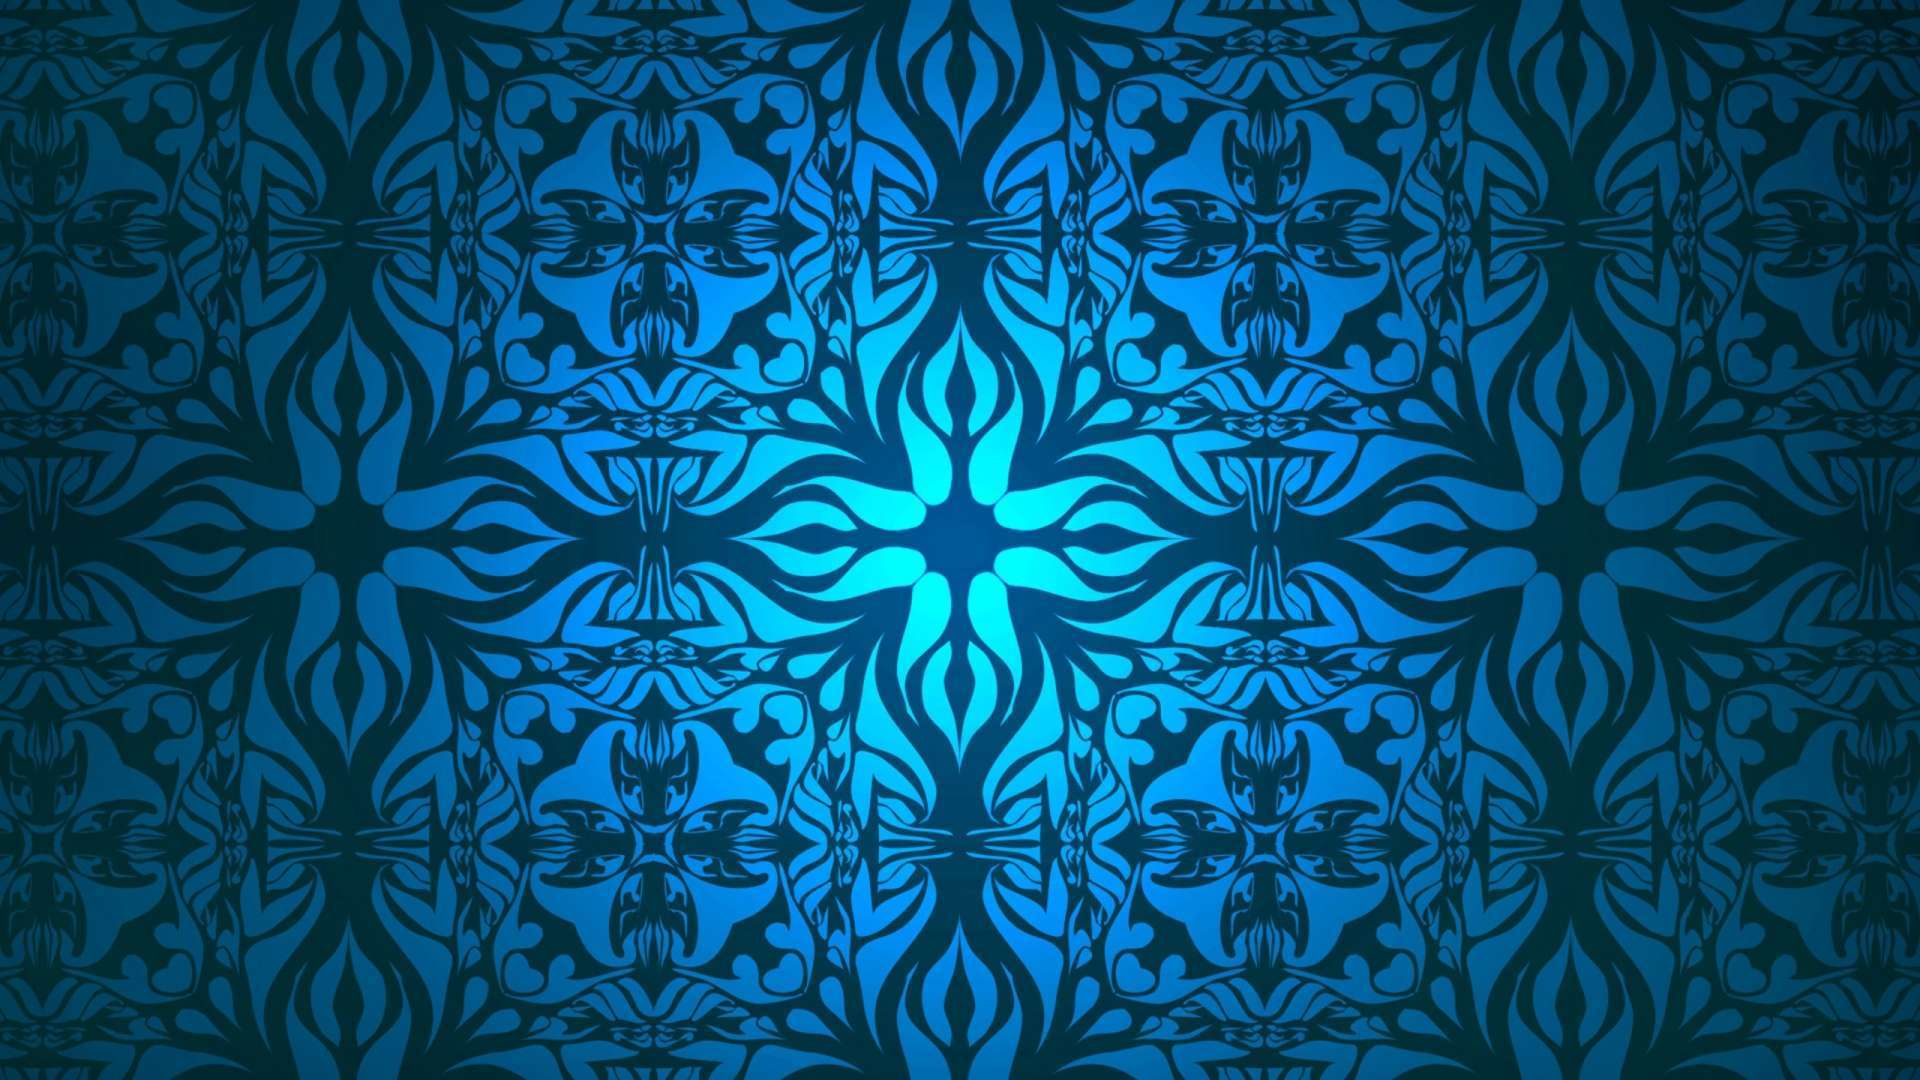 Hd wallpaper 1080p blue wallpapersafari - Hd pattern wallpapers 1080p ...